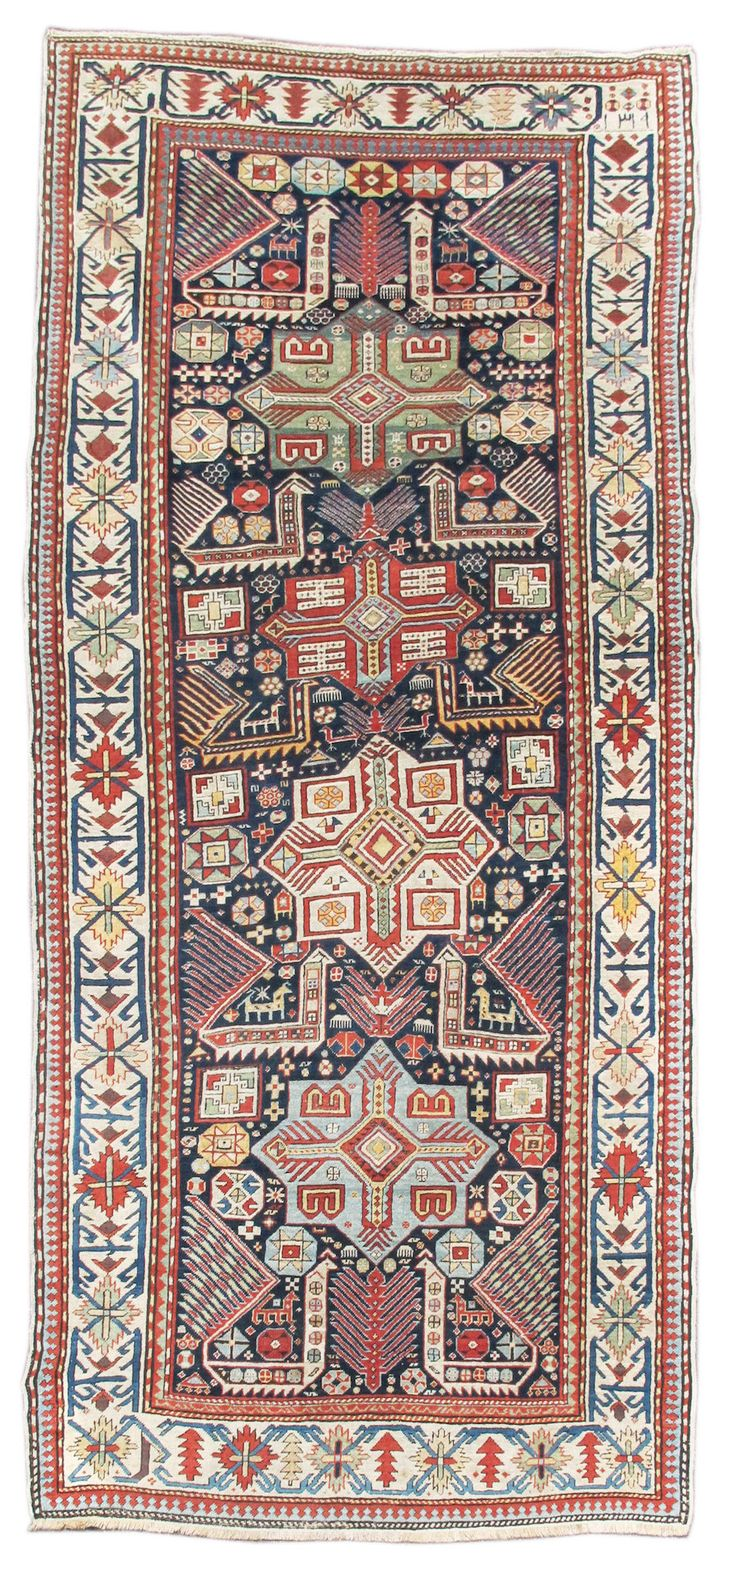 Akstafa rug, late 19th C.